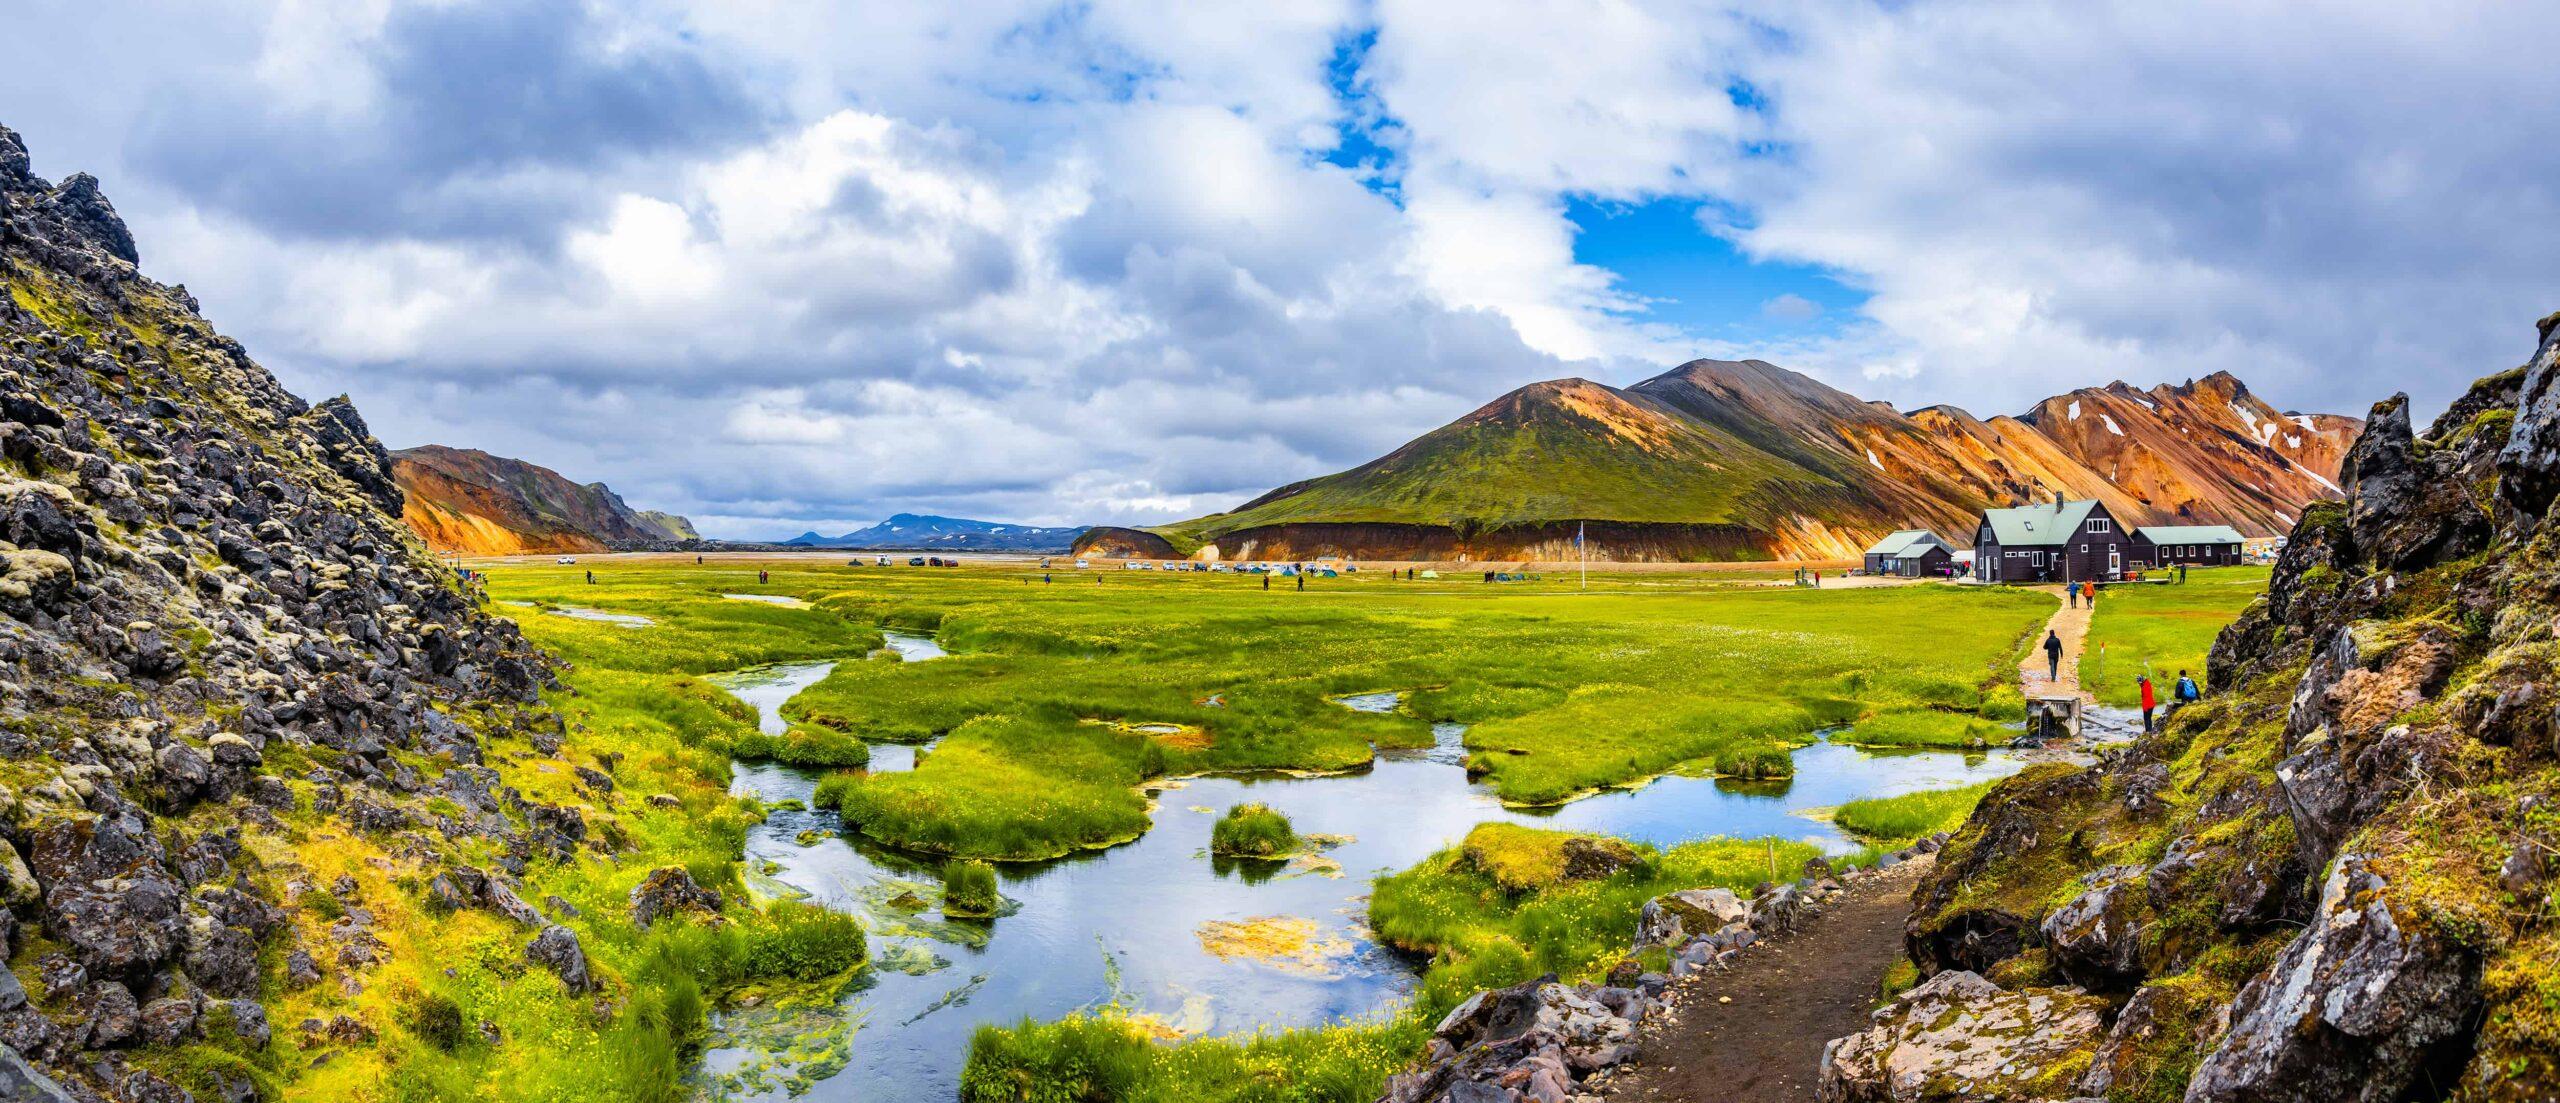 Landmannalaugar hot spring in the highlands of Iceland